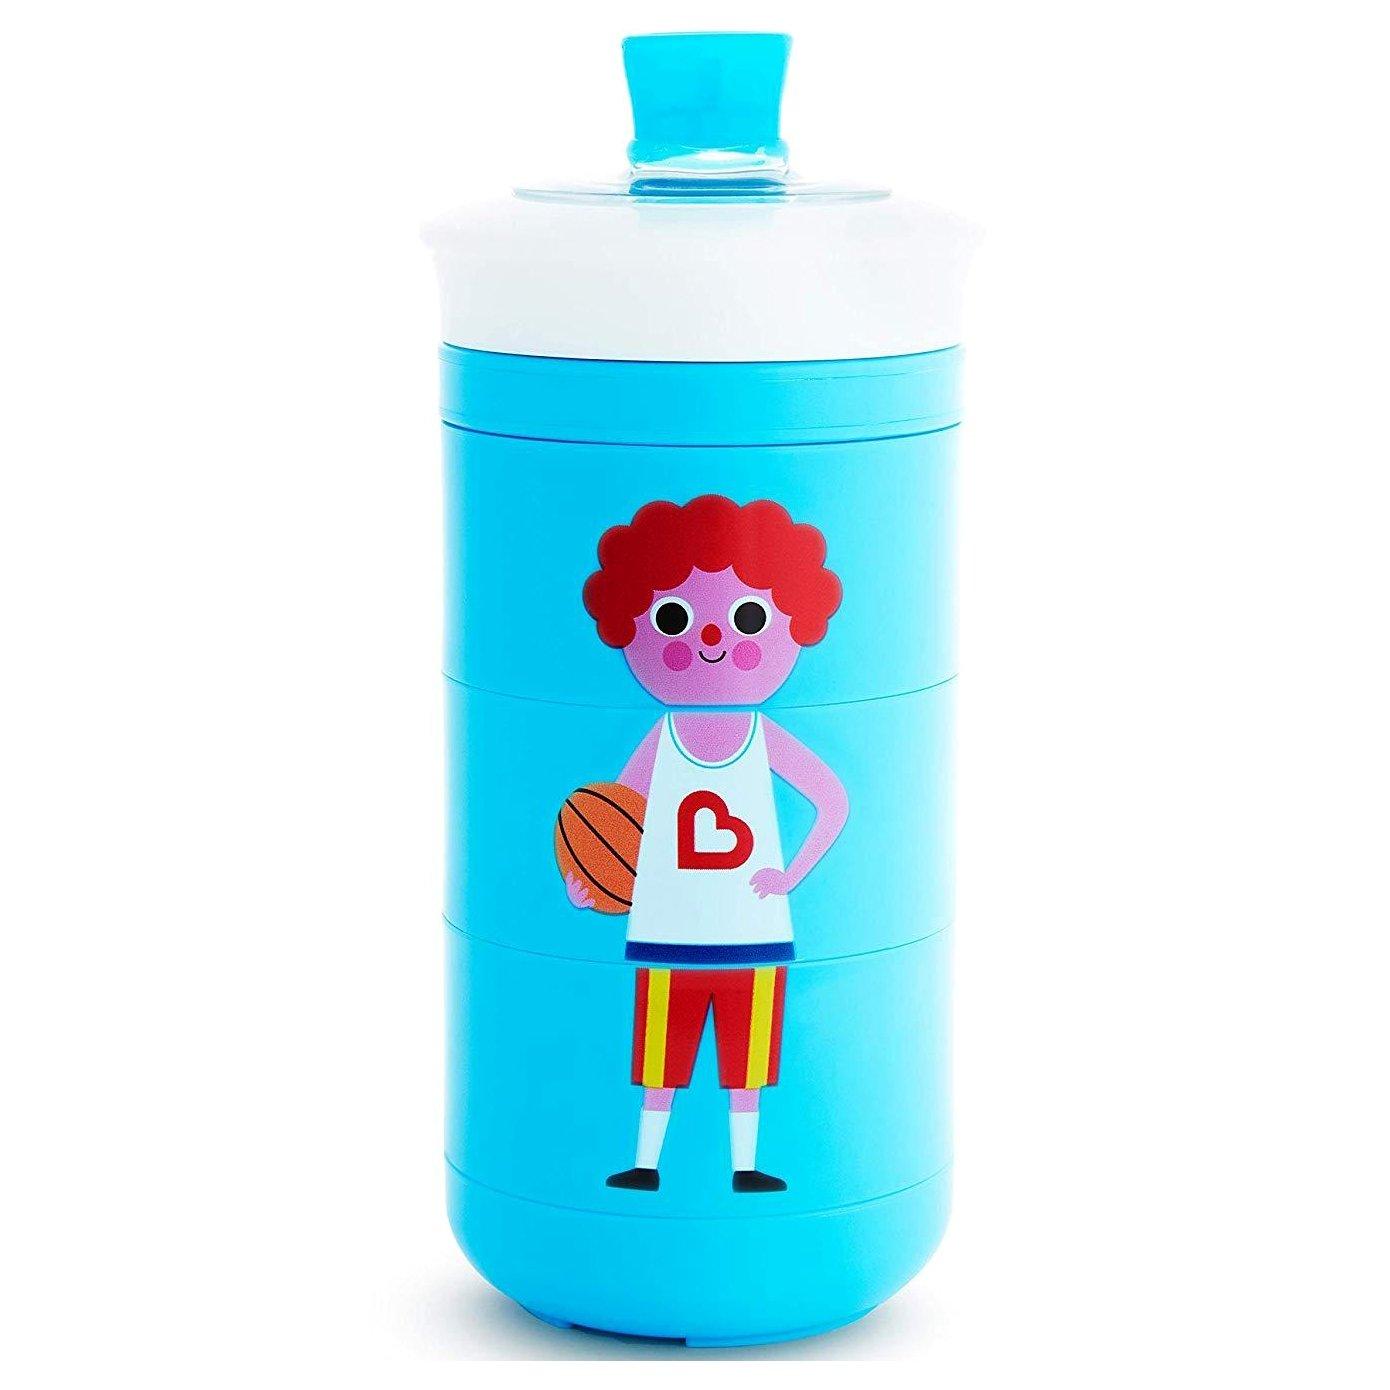 Munchkin Twisty Mix & Match Bite-Proof Sippy Cup Ποτήρι Για Βρέφη & Παιδιά 266ml – γαλάζιο